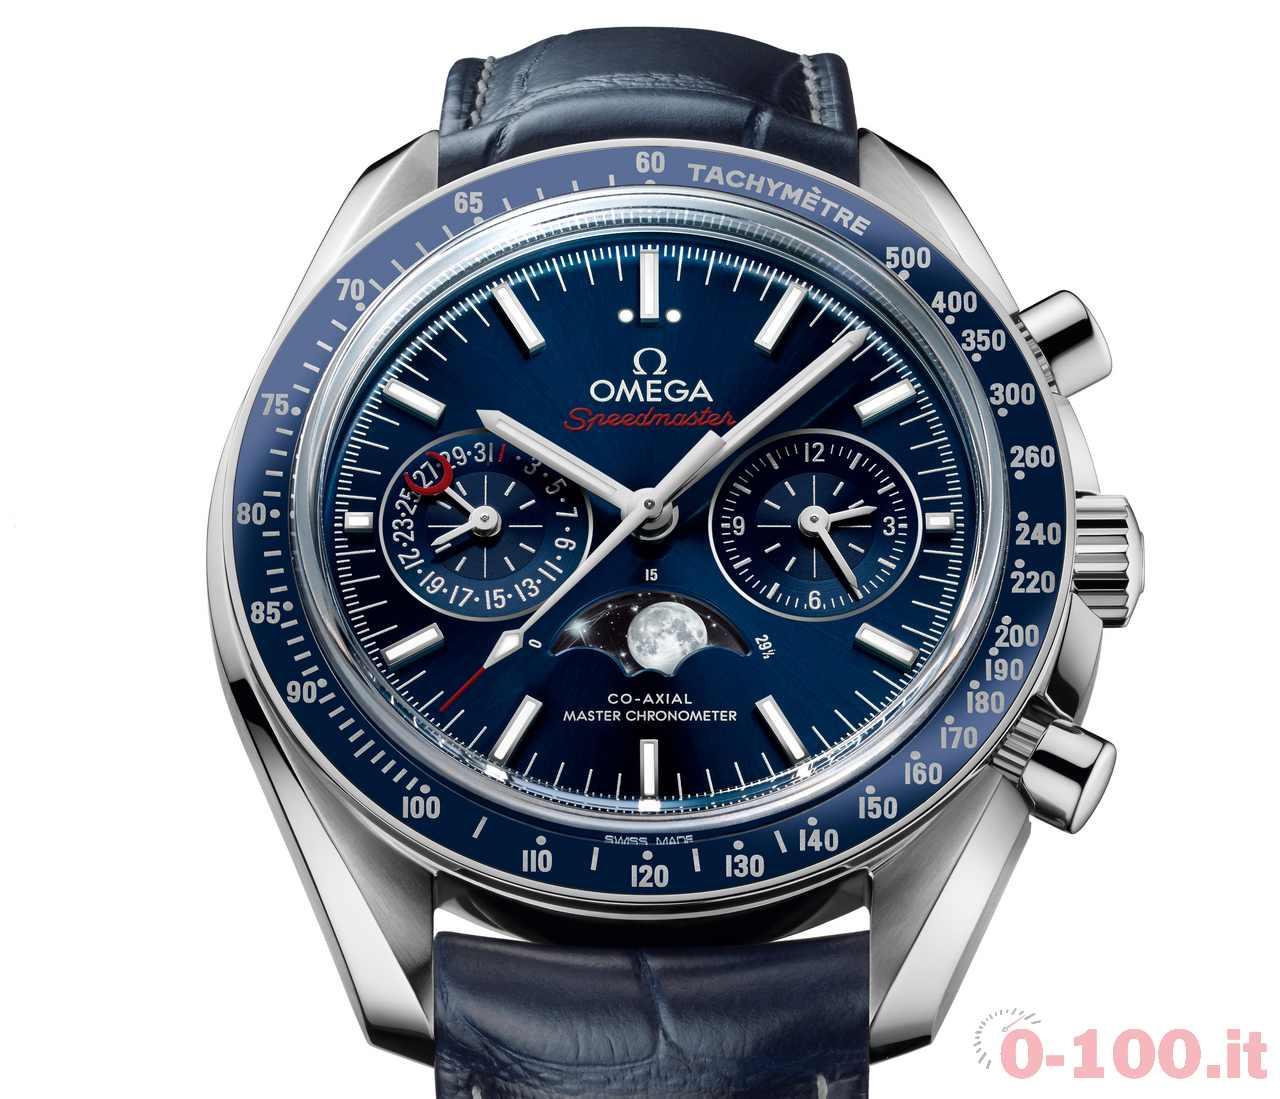 baselworld-2016-omega-speedmaster-moonphase-master-chronometer-ref-304-33-44-52-03-001_0-1002